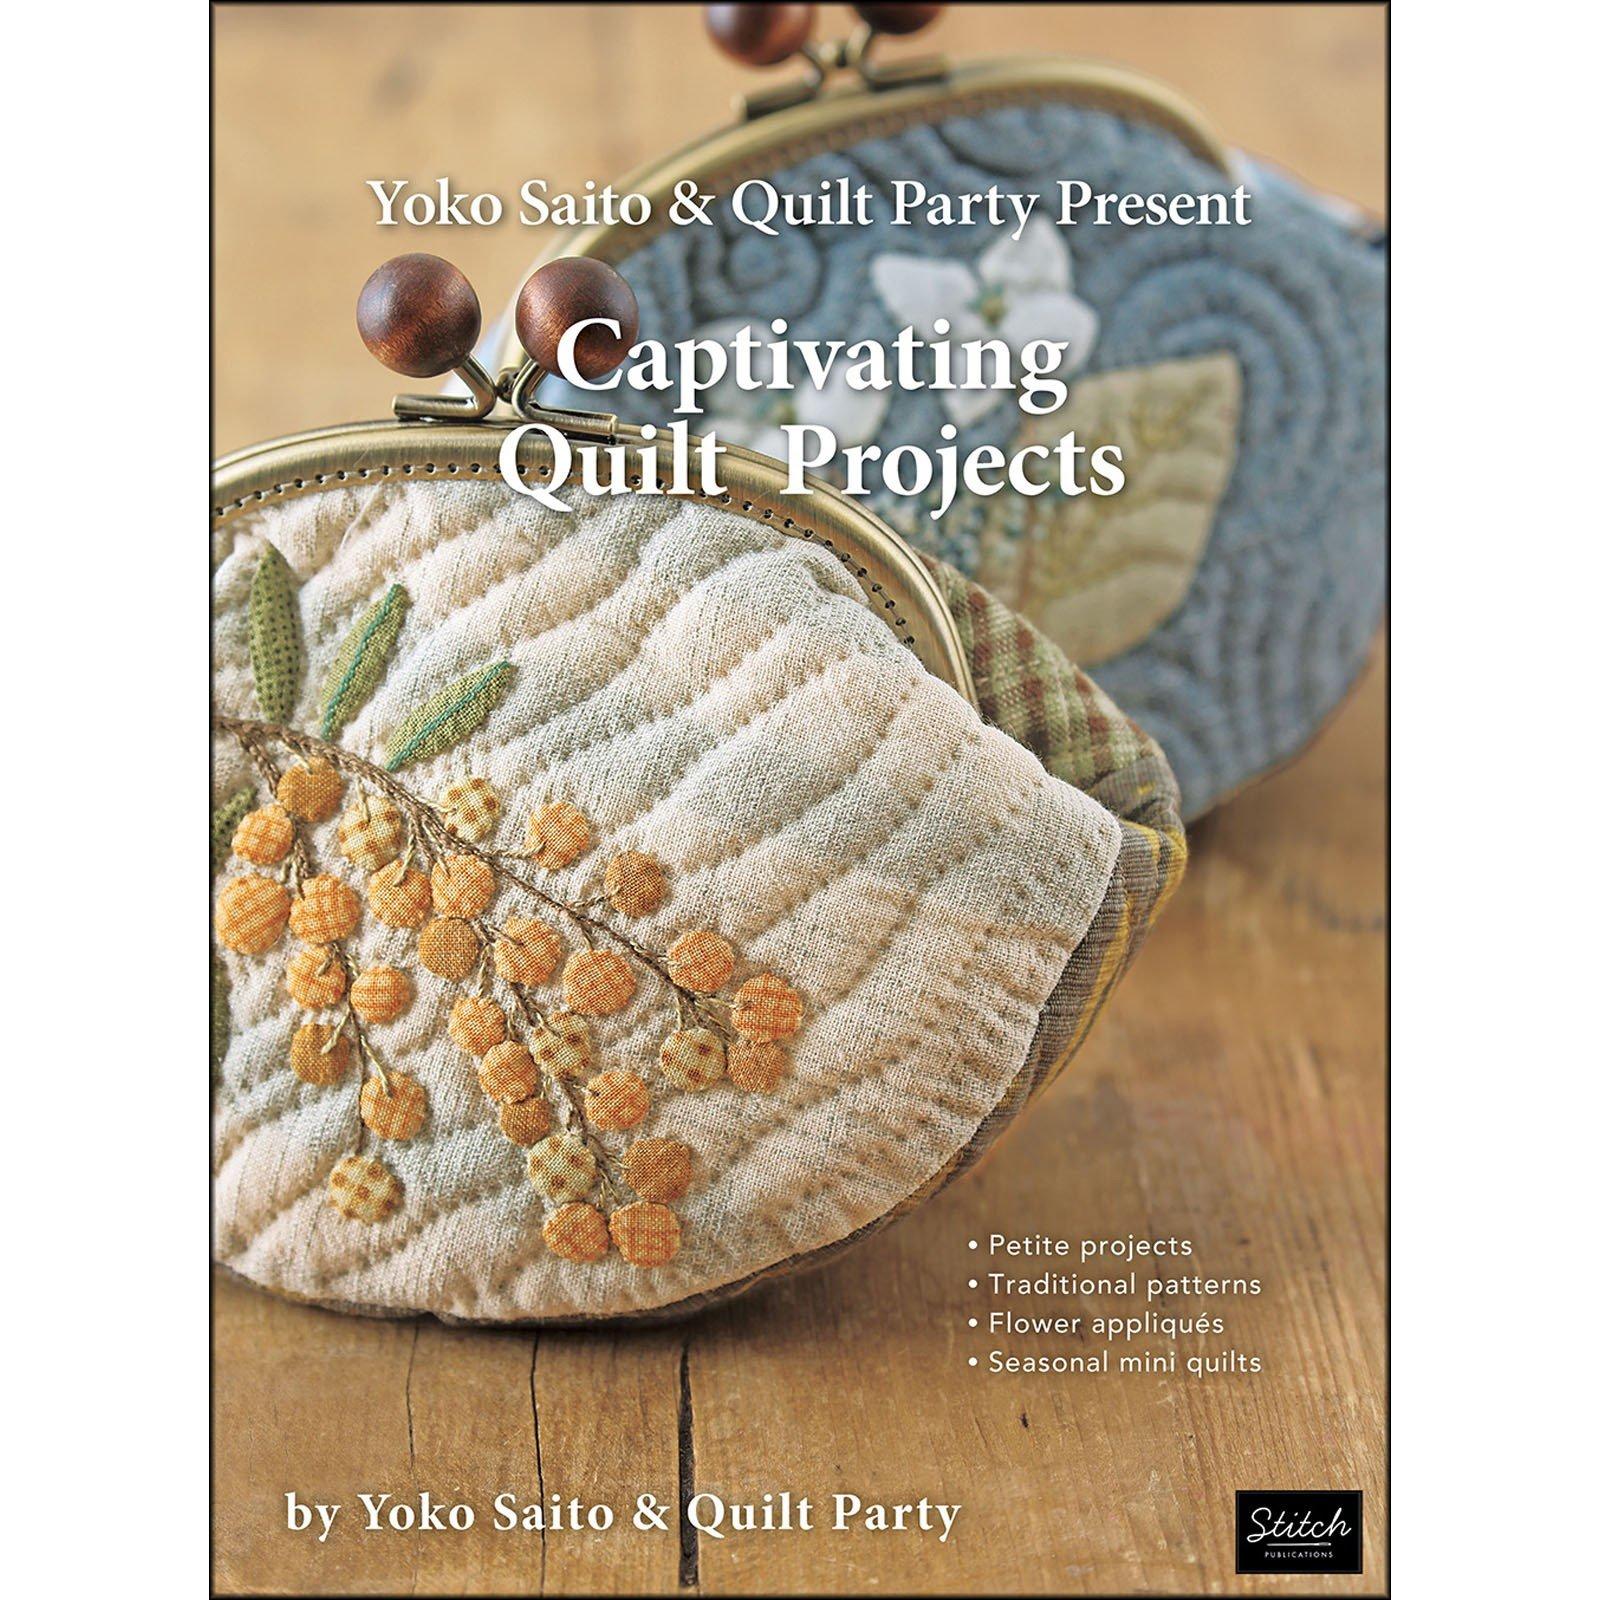 Yoko Saito Book: Captivating Quilt Projects